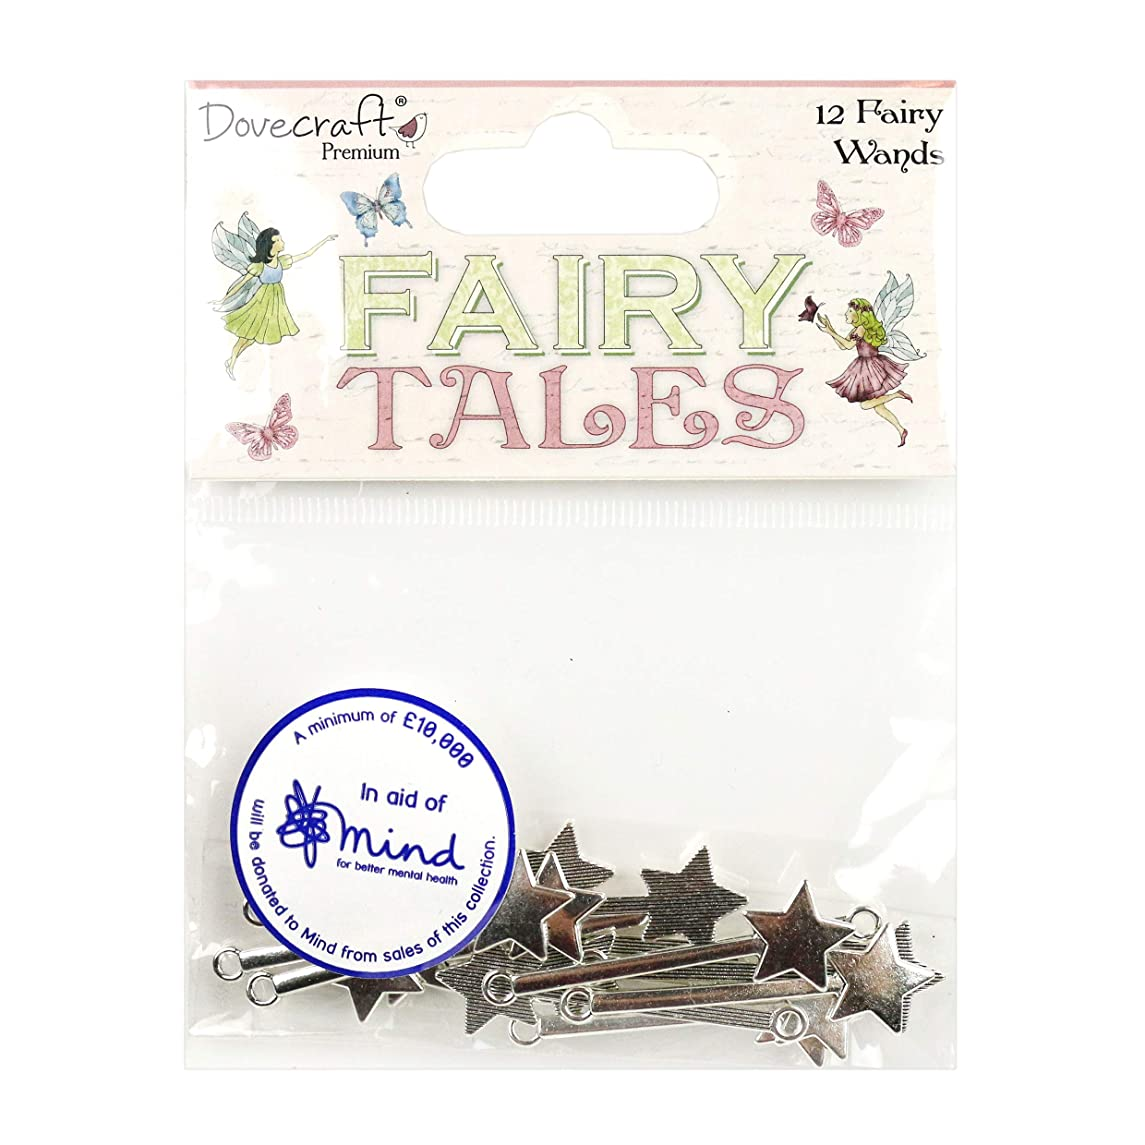 Dovecraft Premium Tales Metal Fairy Wands, Multicolour, 1